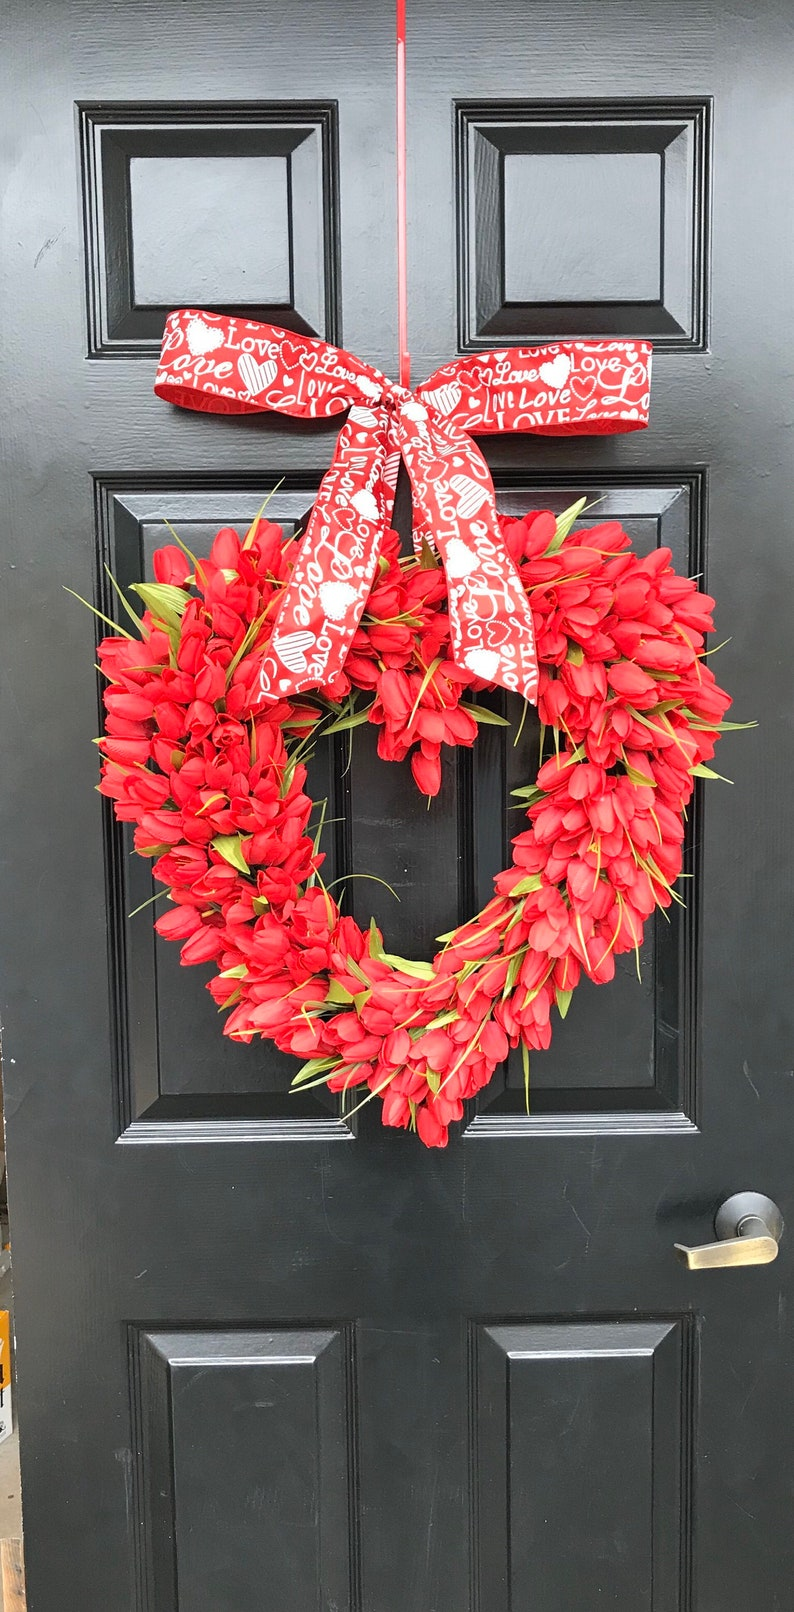 XL Red Tulip Heart Wreath  Valentine's Day Wreath  Heart image 1